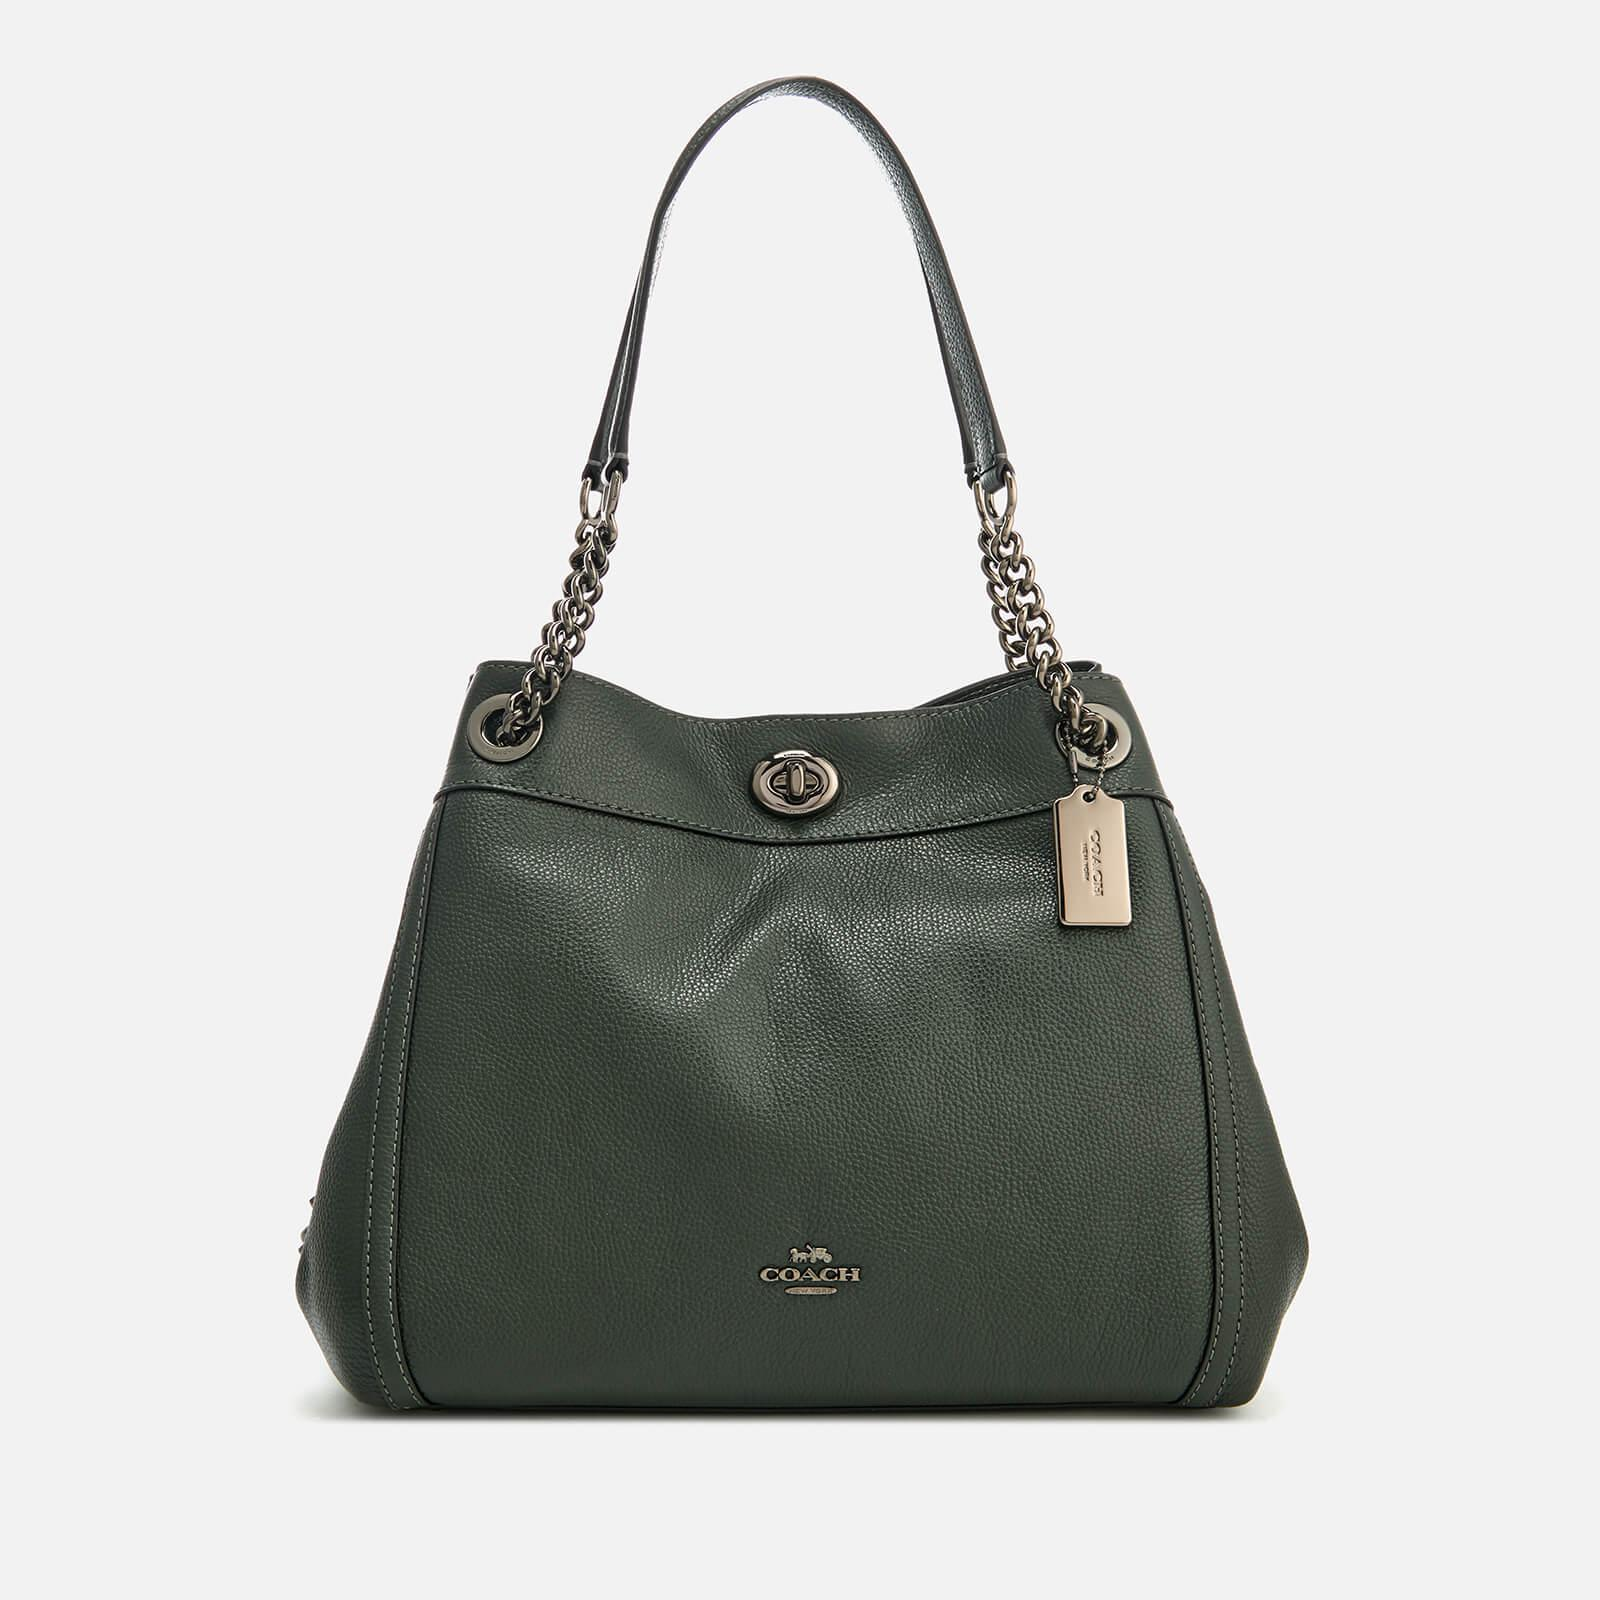 Lyst - COACH Turnlock Edie Bag in Green d4a292caa3904